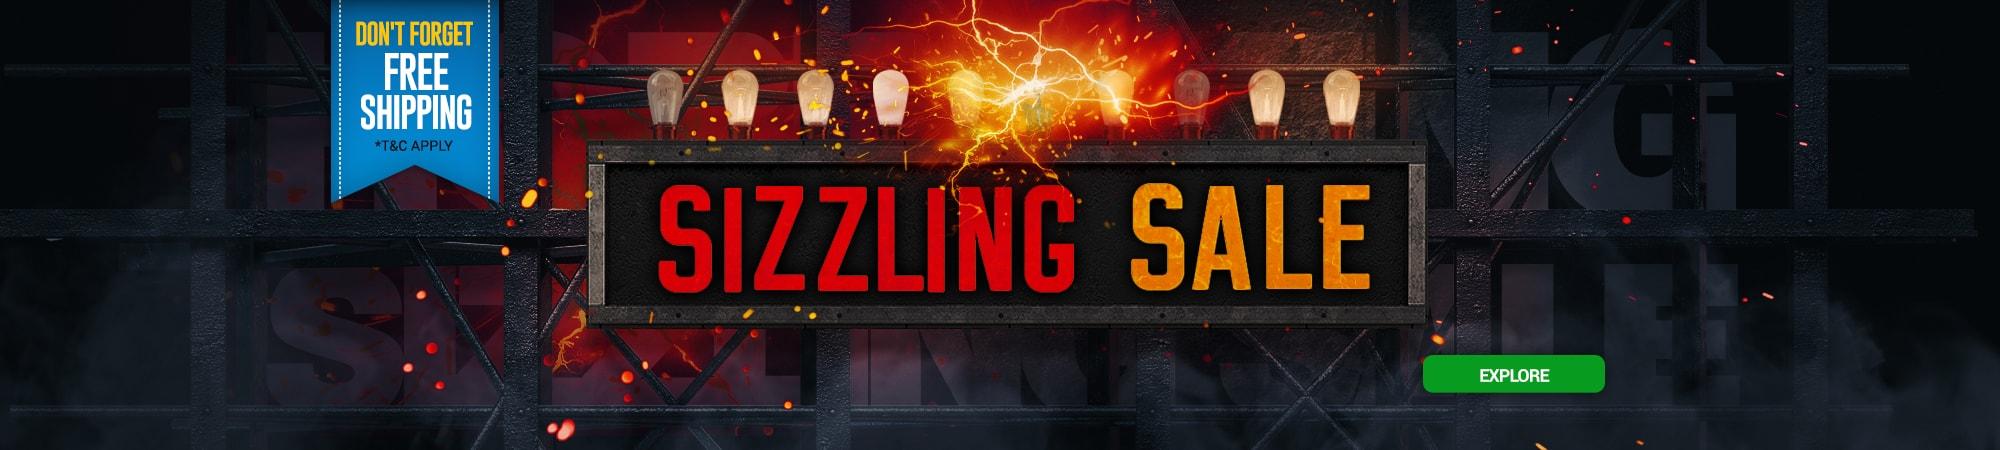 Sizzling Sale